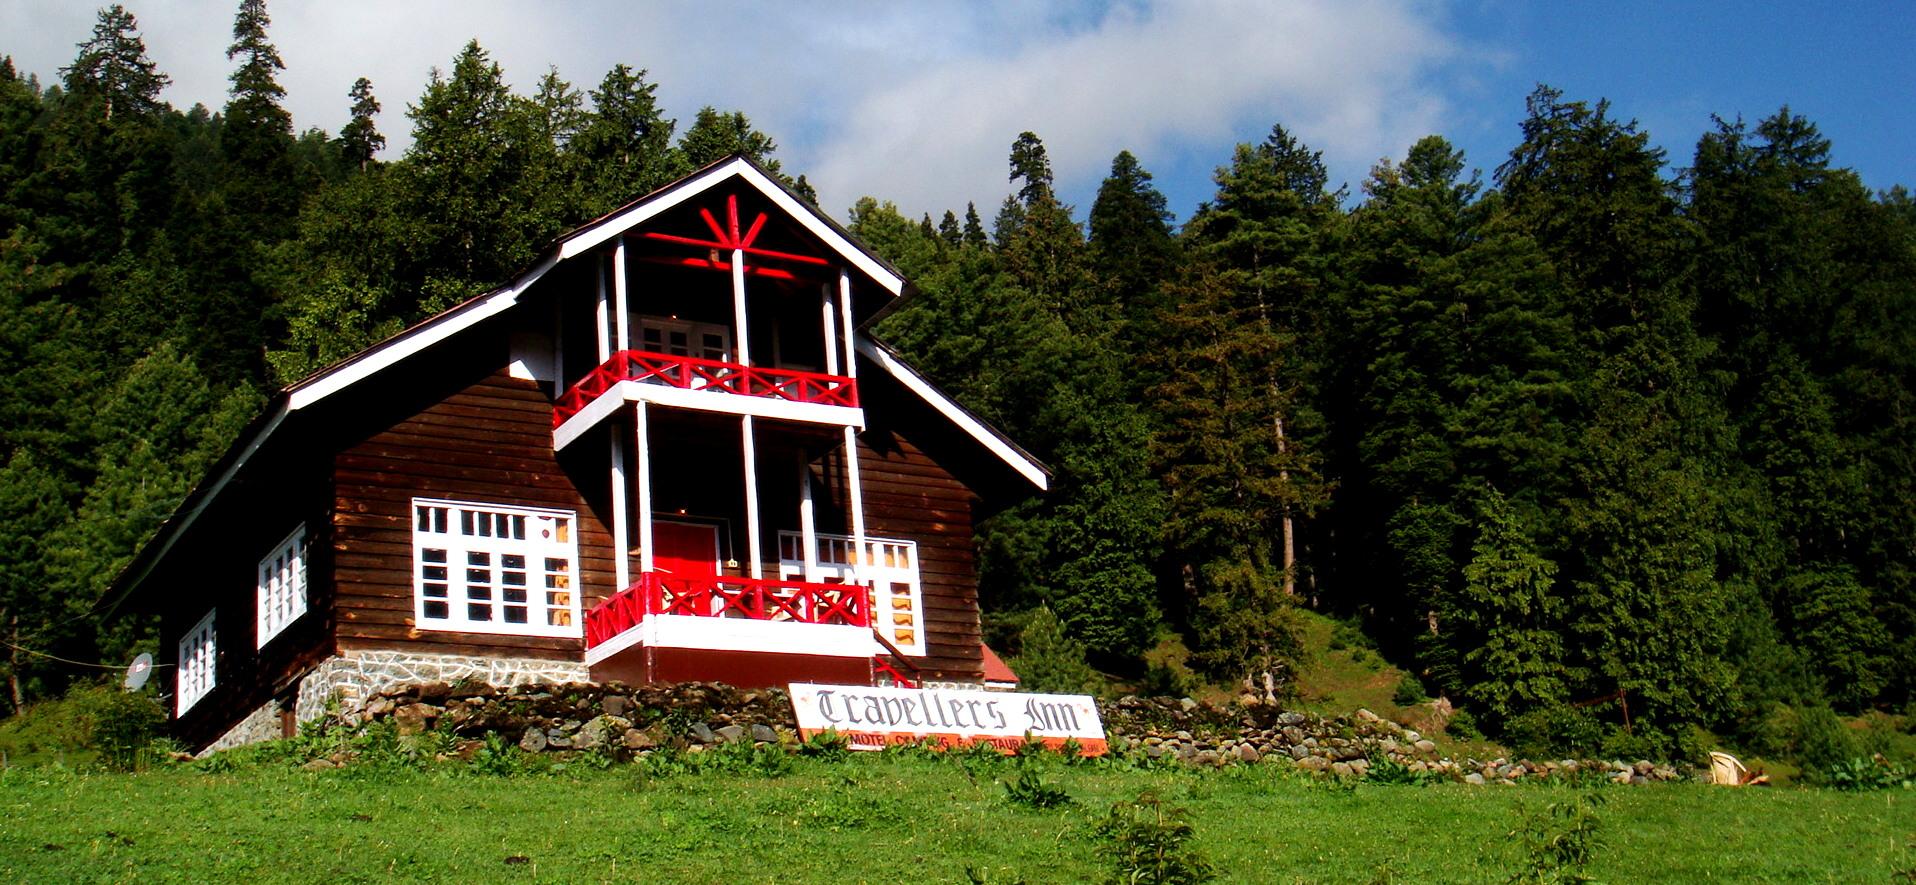 Travellers Inn - Aru Road - Pahalgam Image